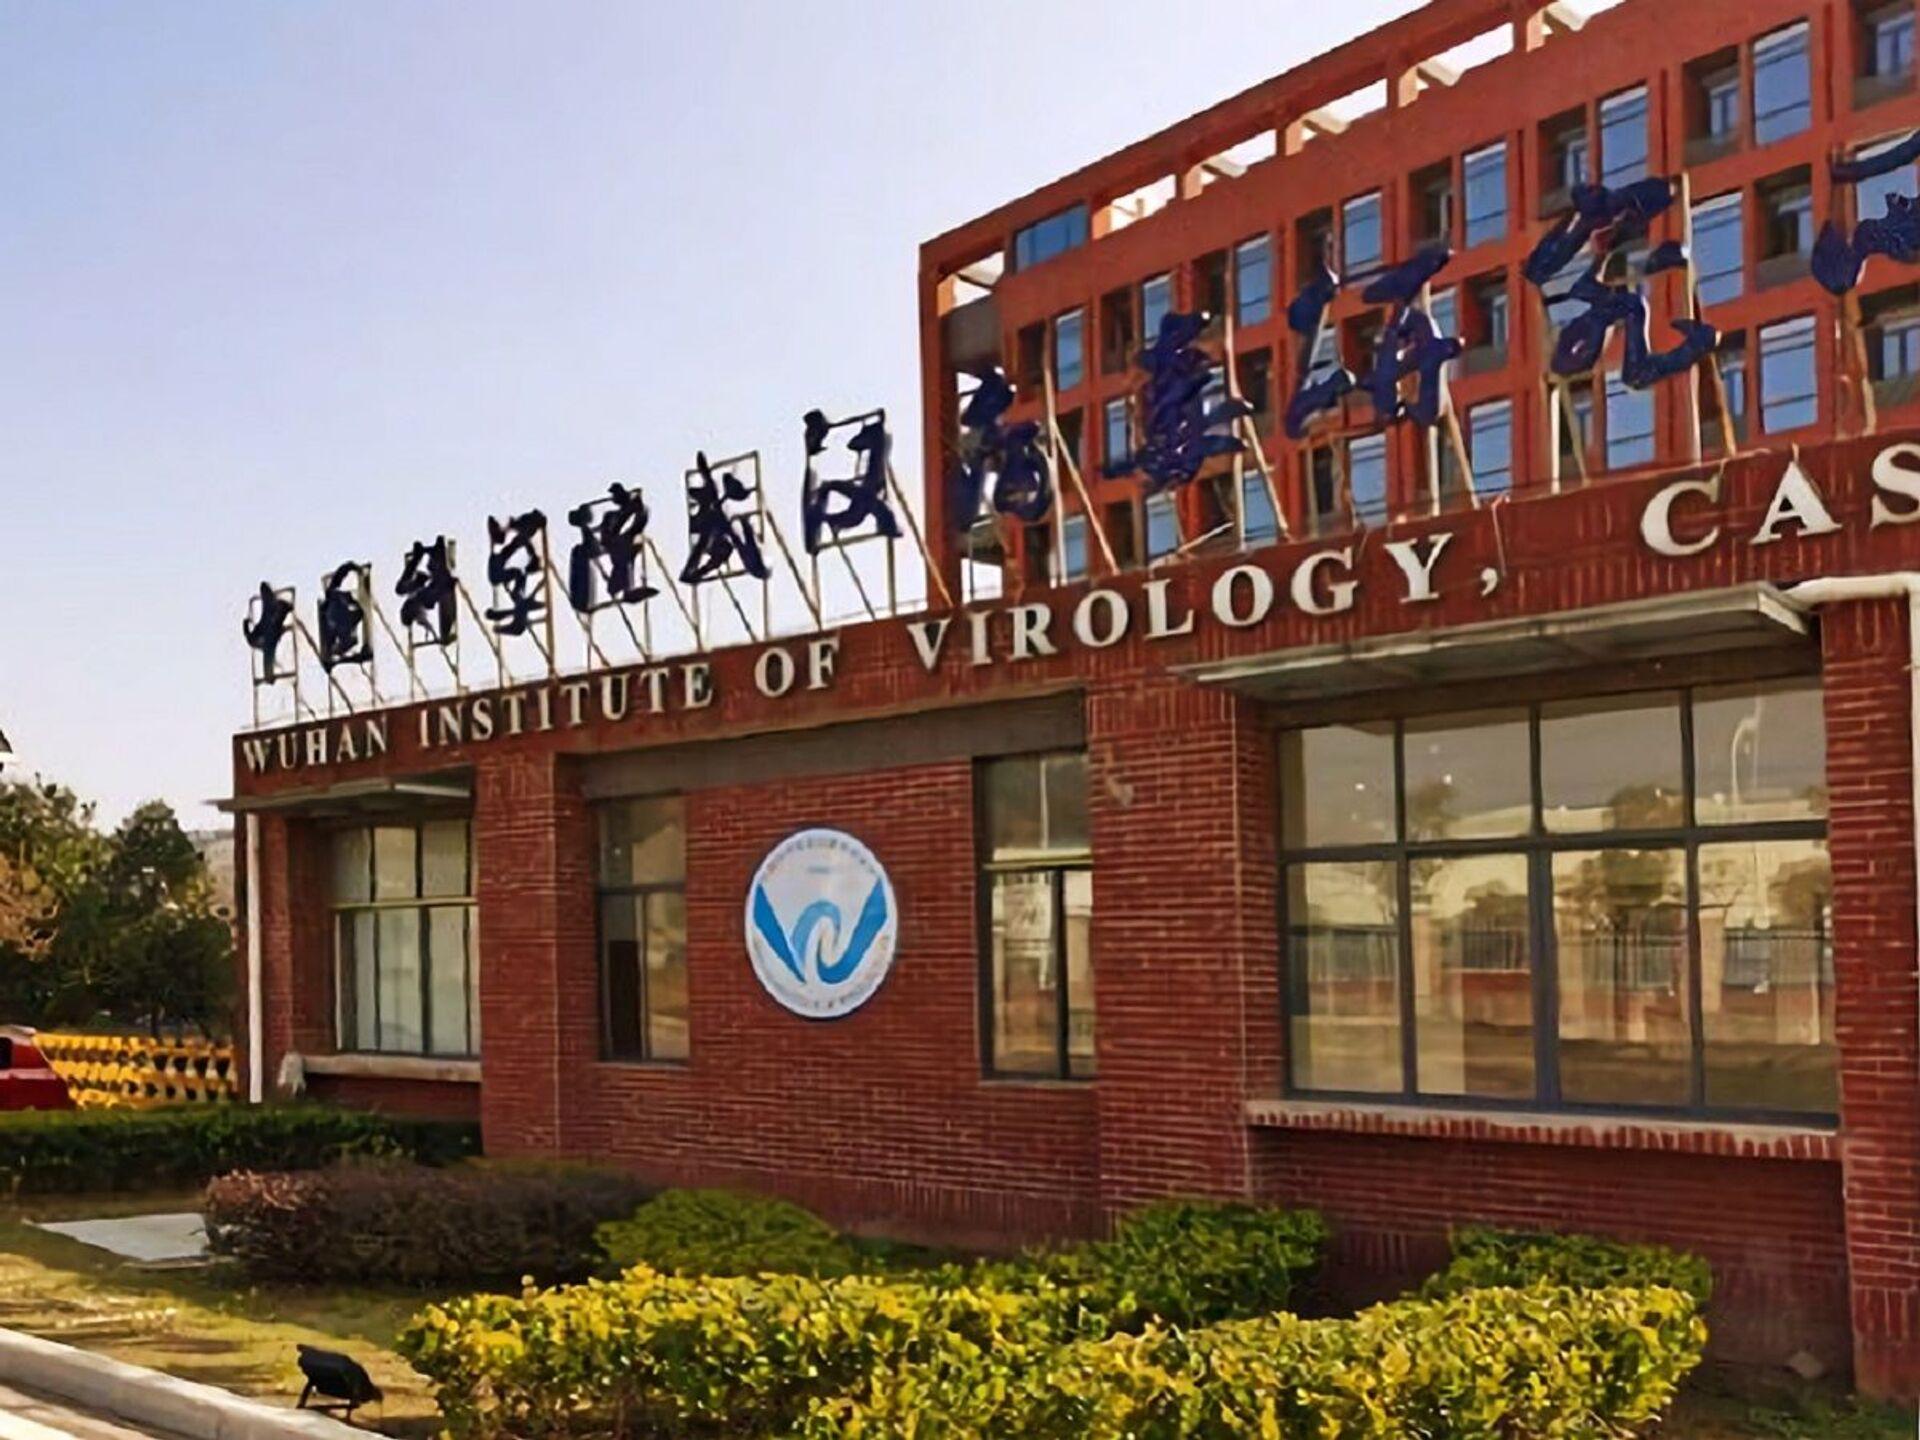 Wuhan Institute of Virology  - Sputnik International, 1920, 07.09.2021